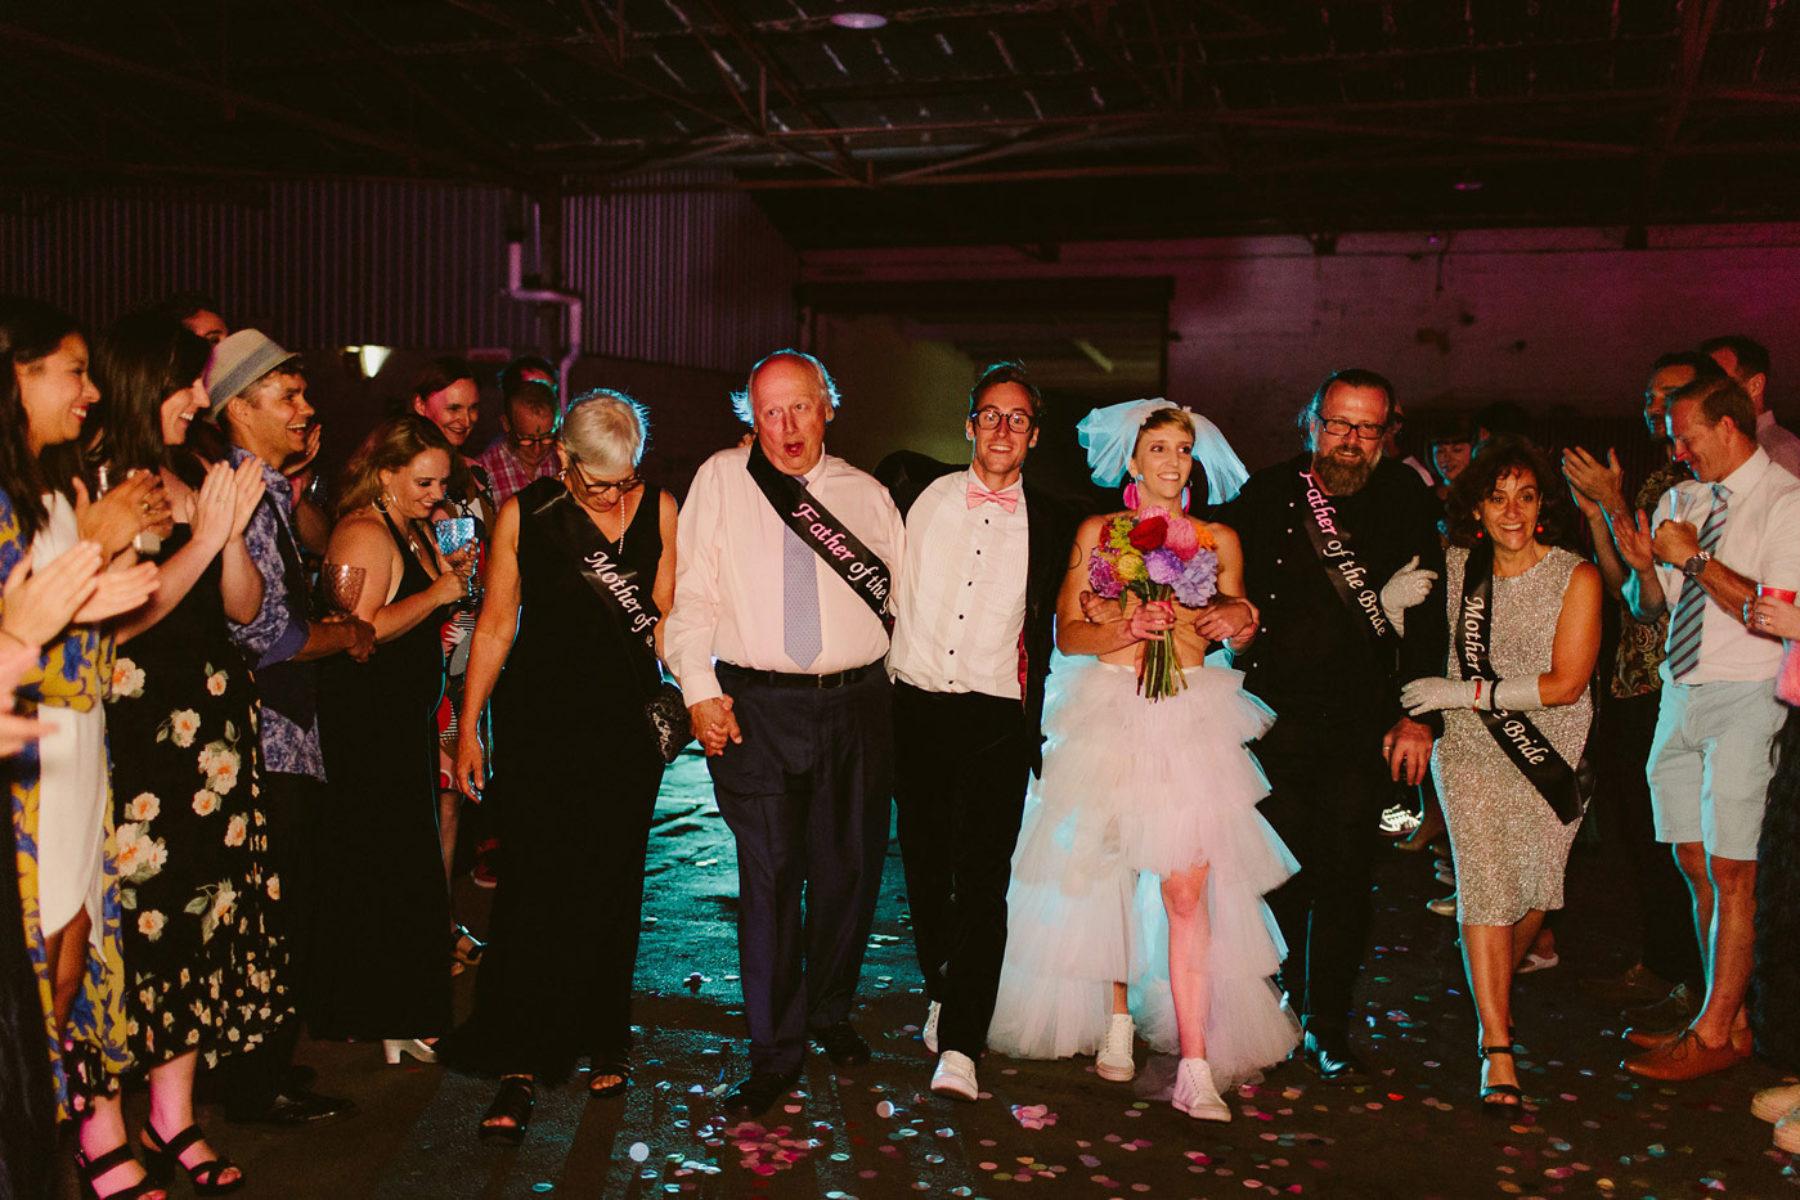 adelaide-warehouse-party-wedding-40-1800x0-c-default.jpg